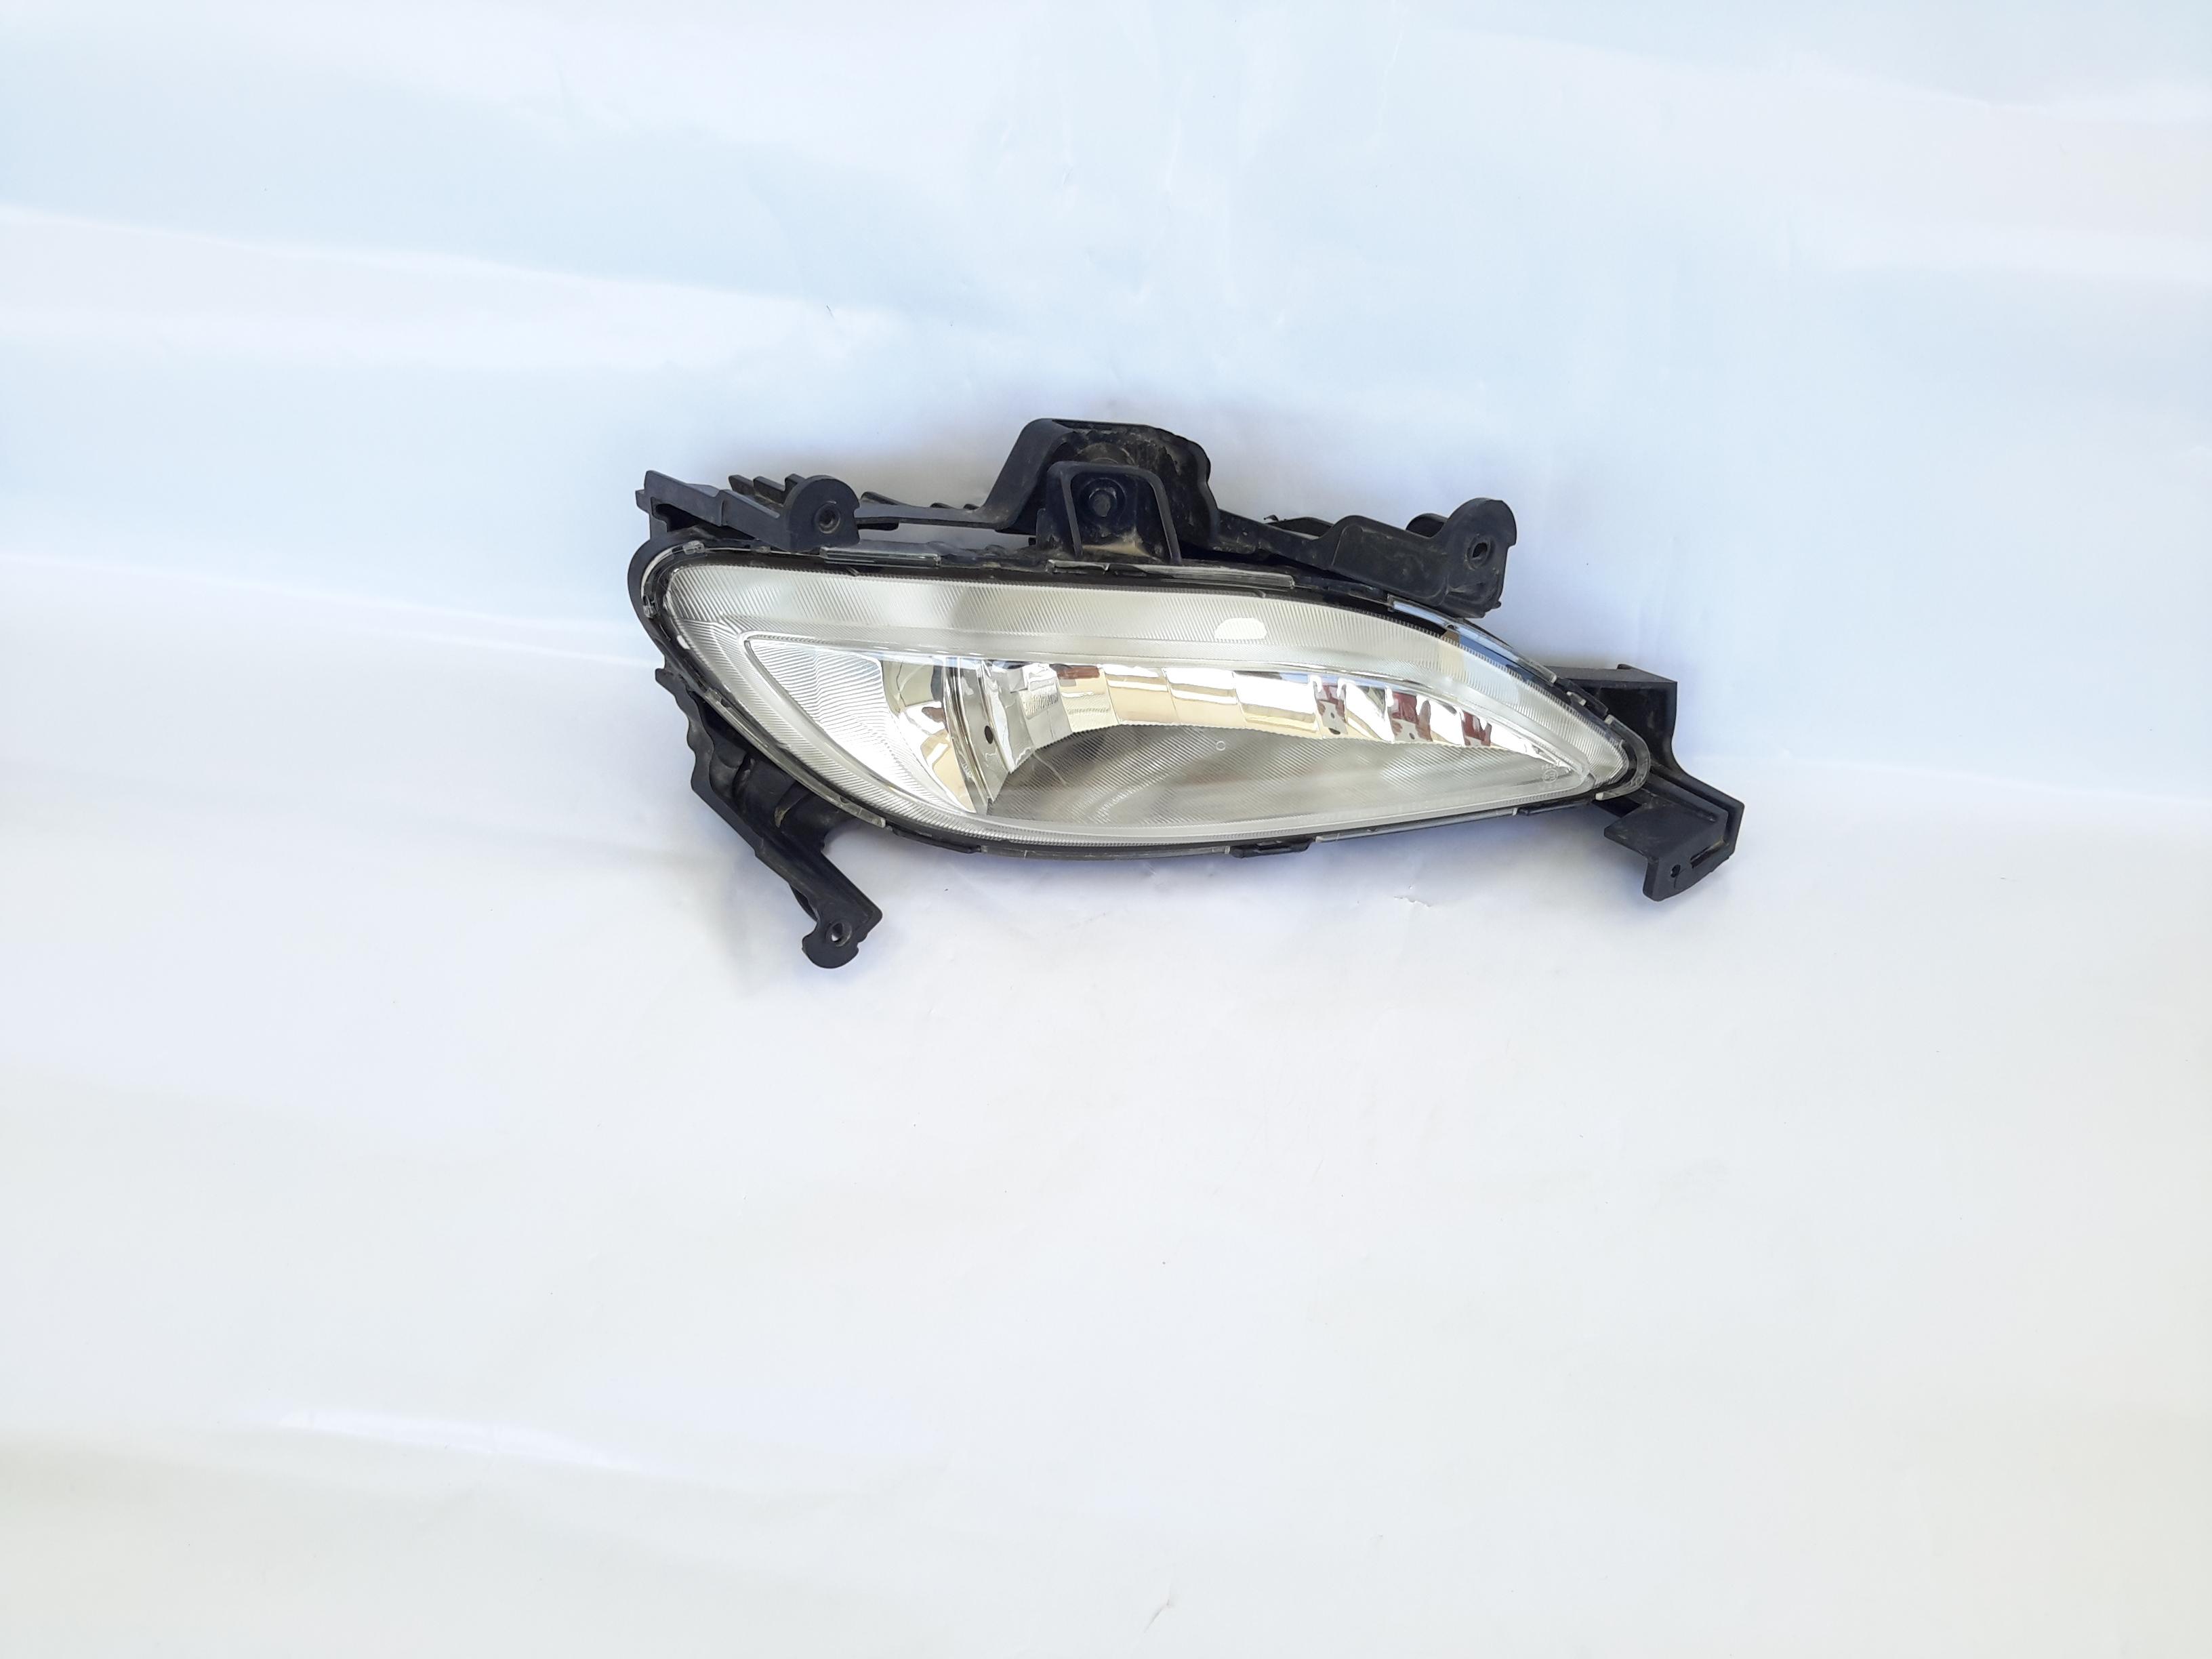 Hyundai sonata 2012 foglight (922013s)